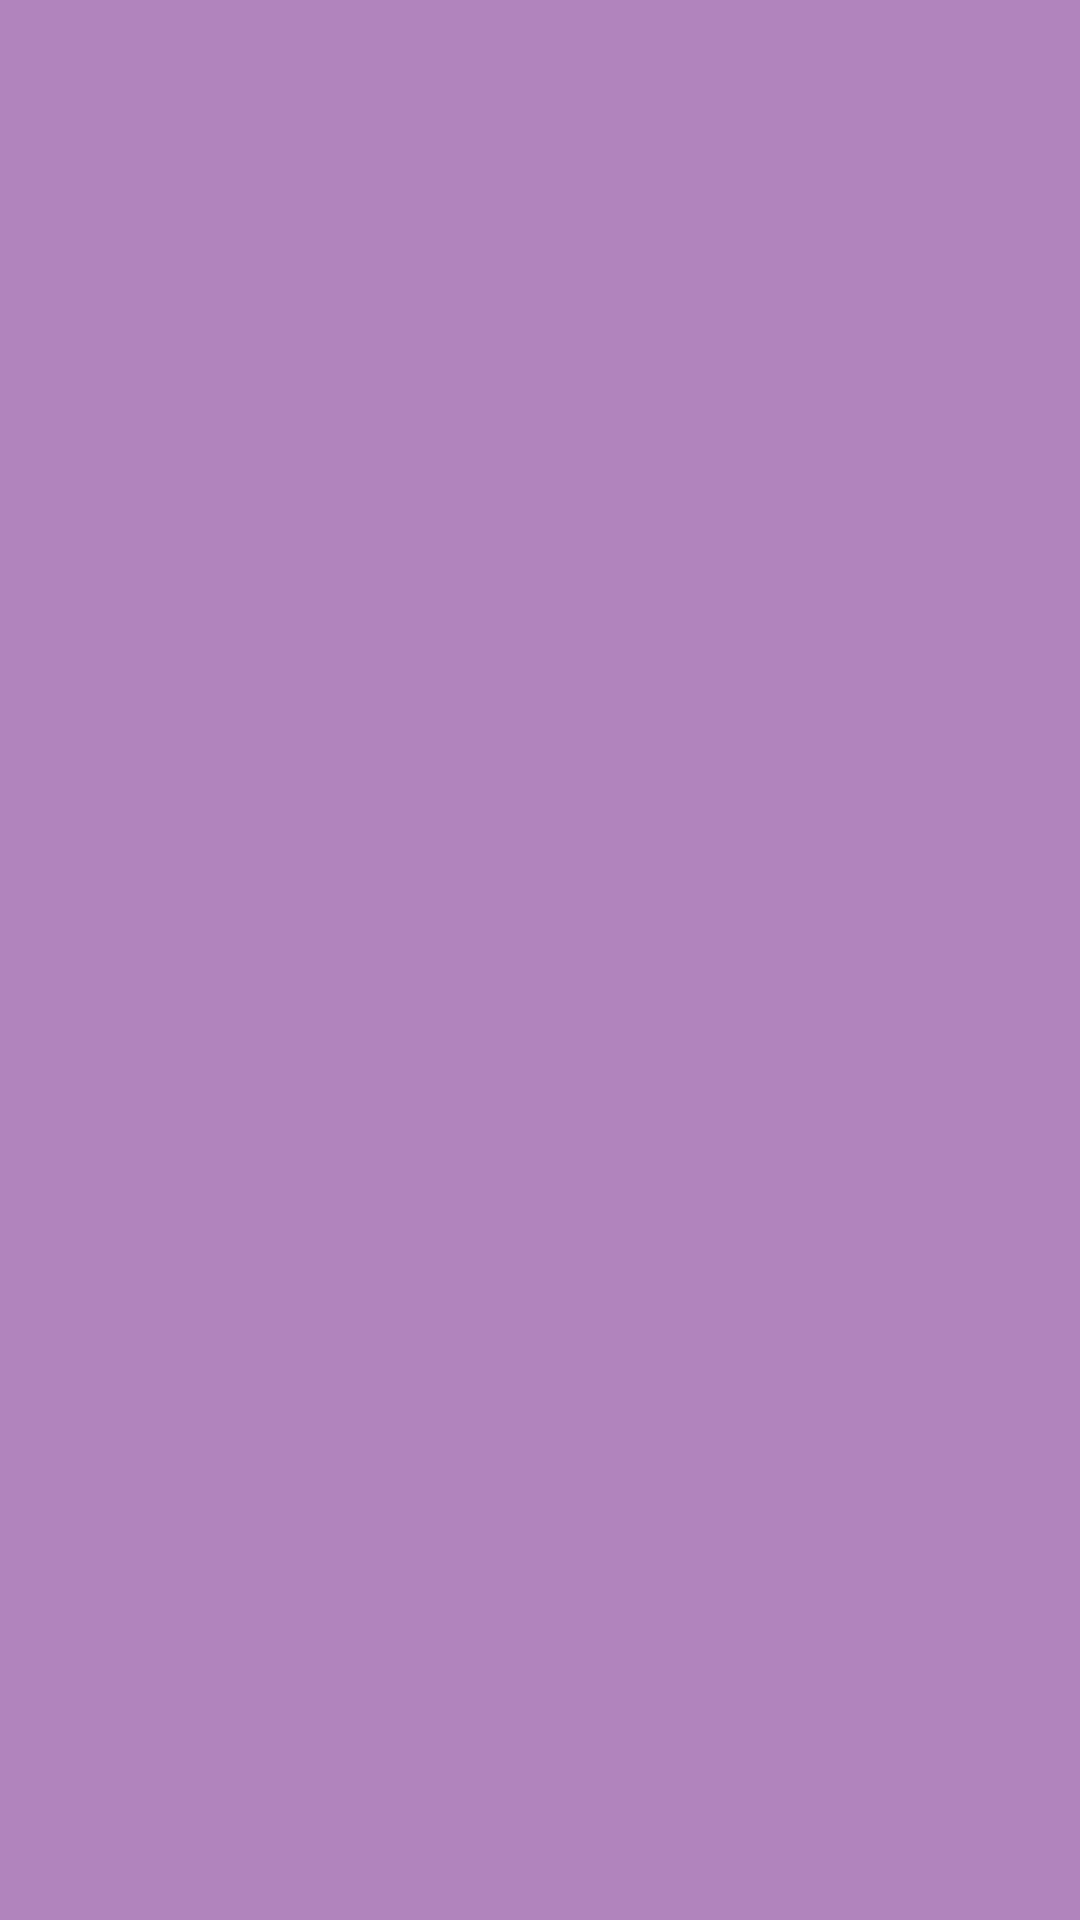 1080x1920 African Violet Solid Color Background